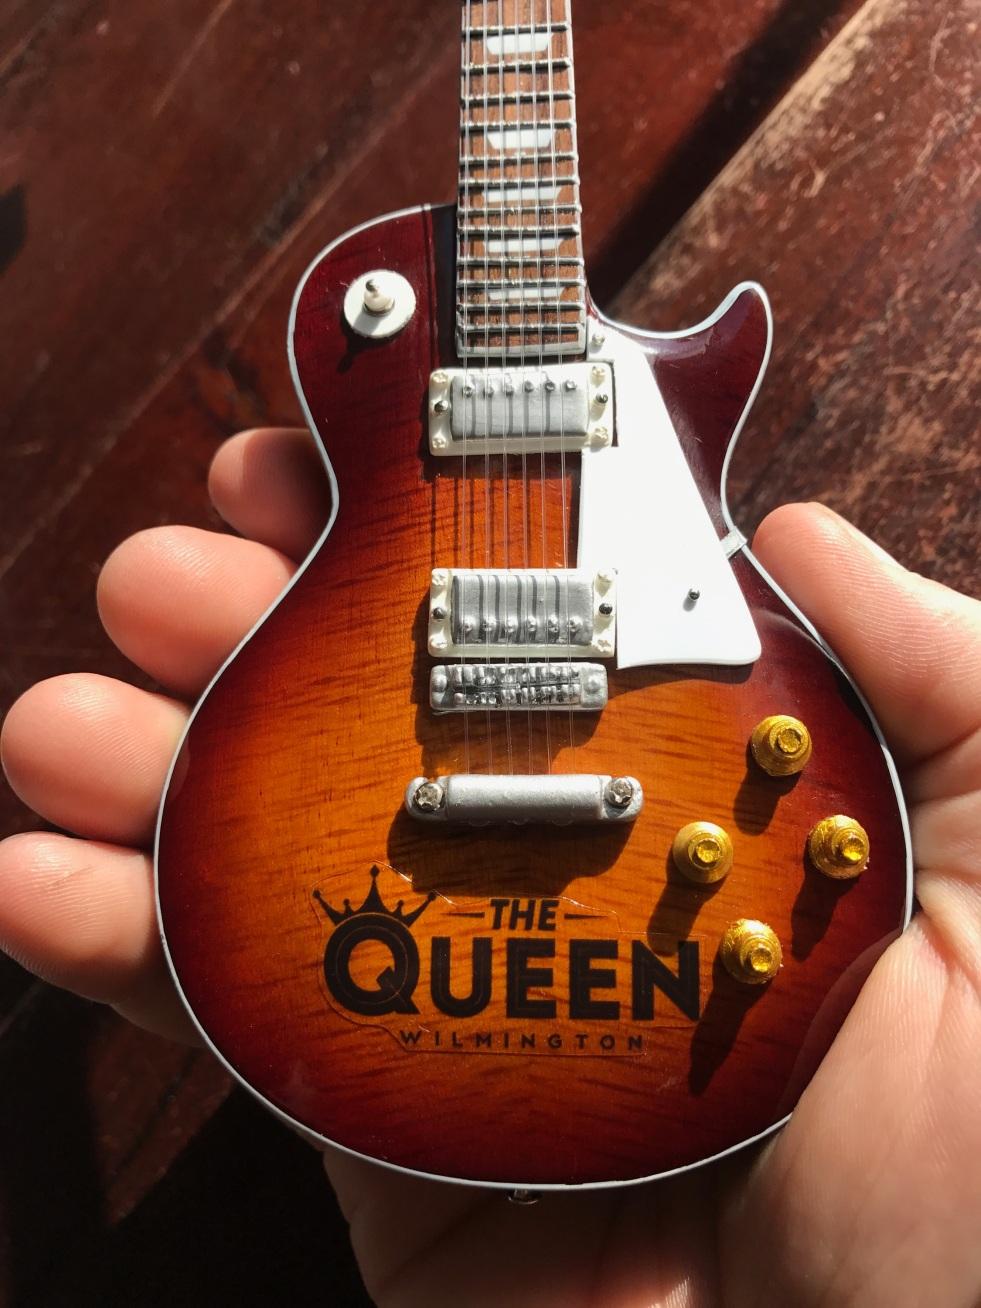 TheQueen-Promo-Guitar